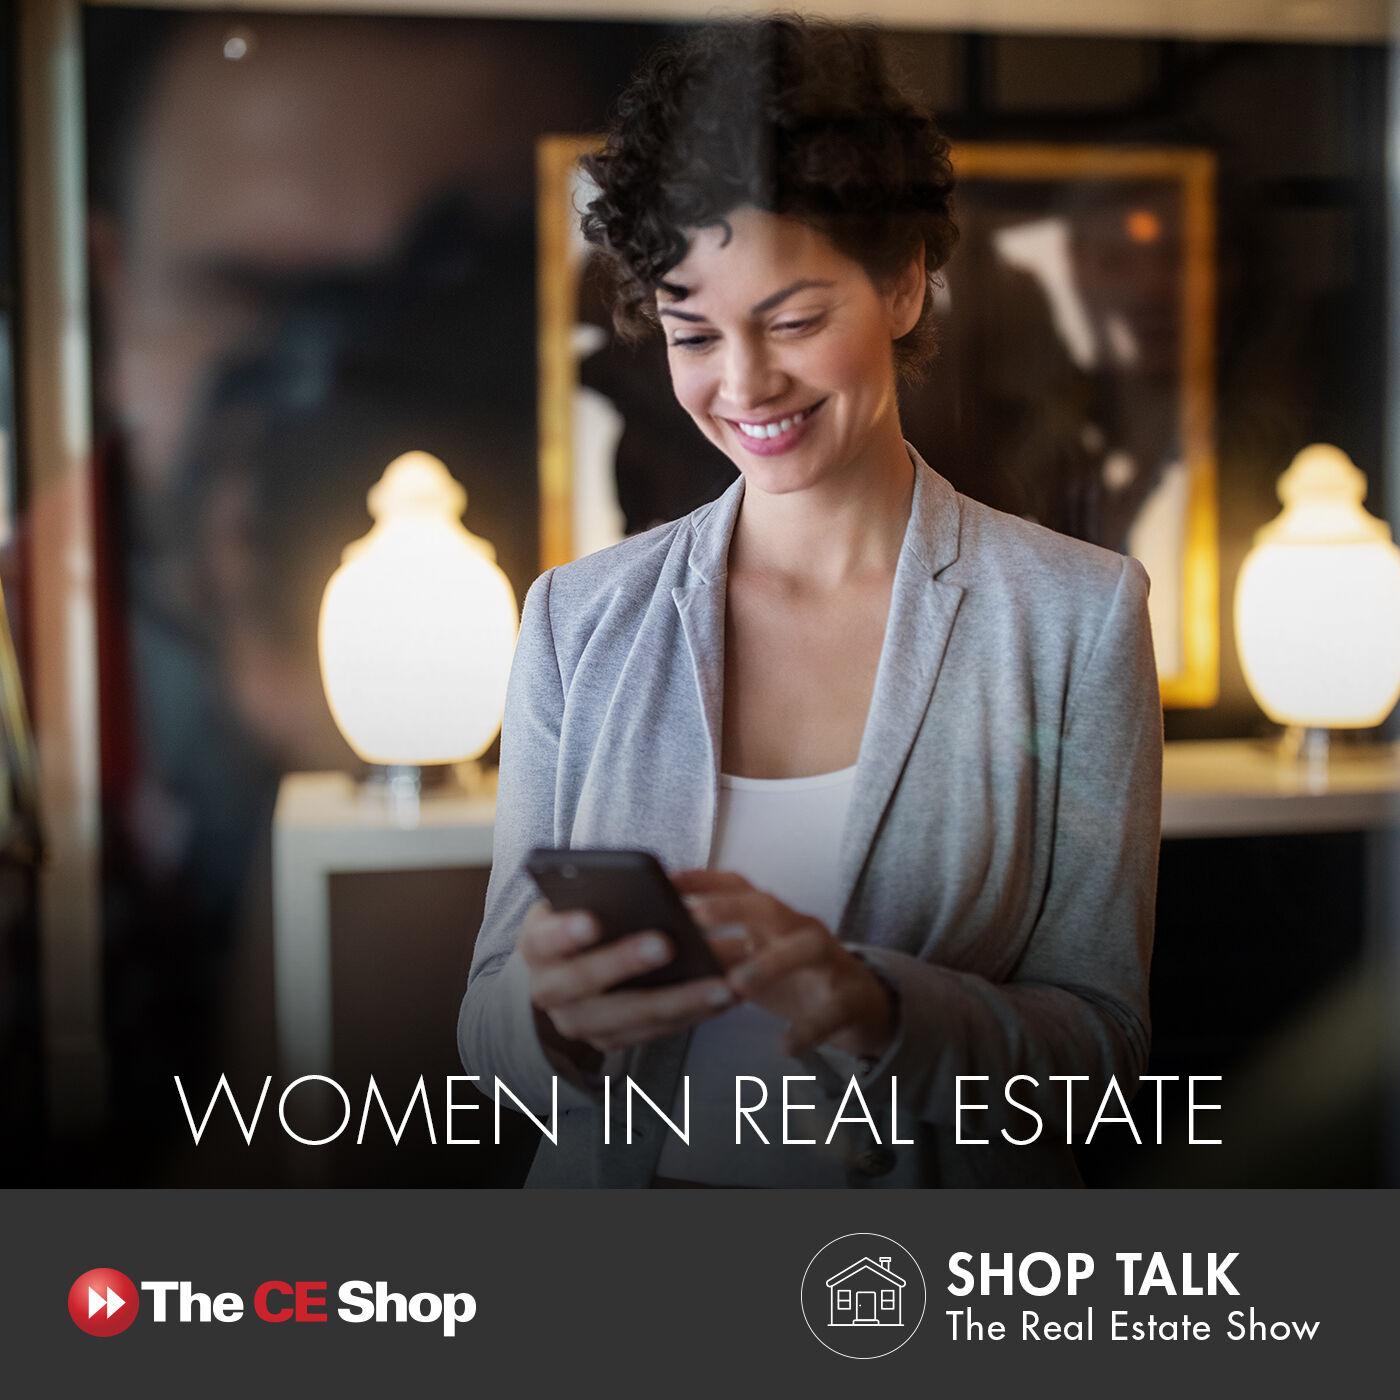 63: Women in Real Estate